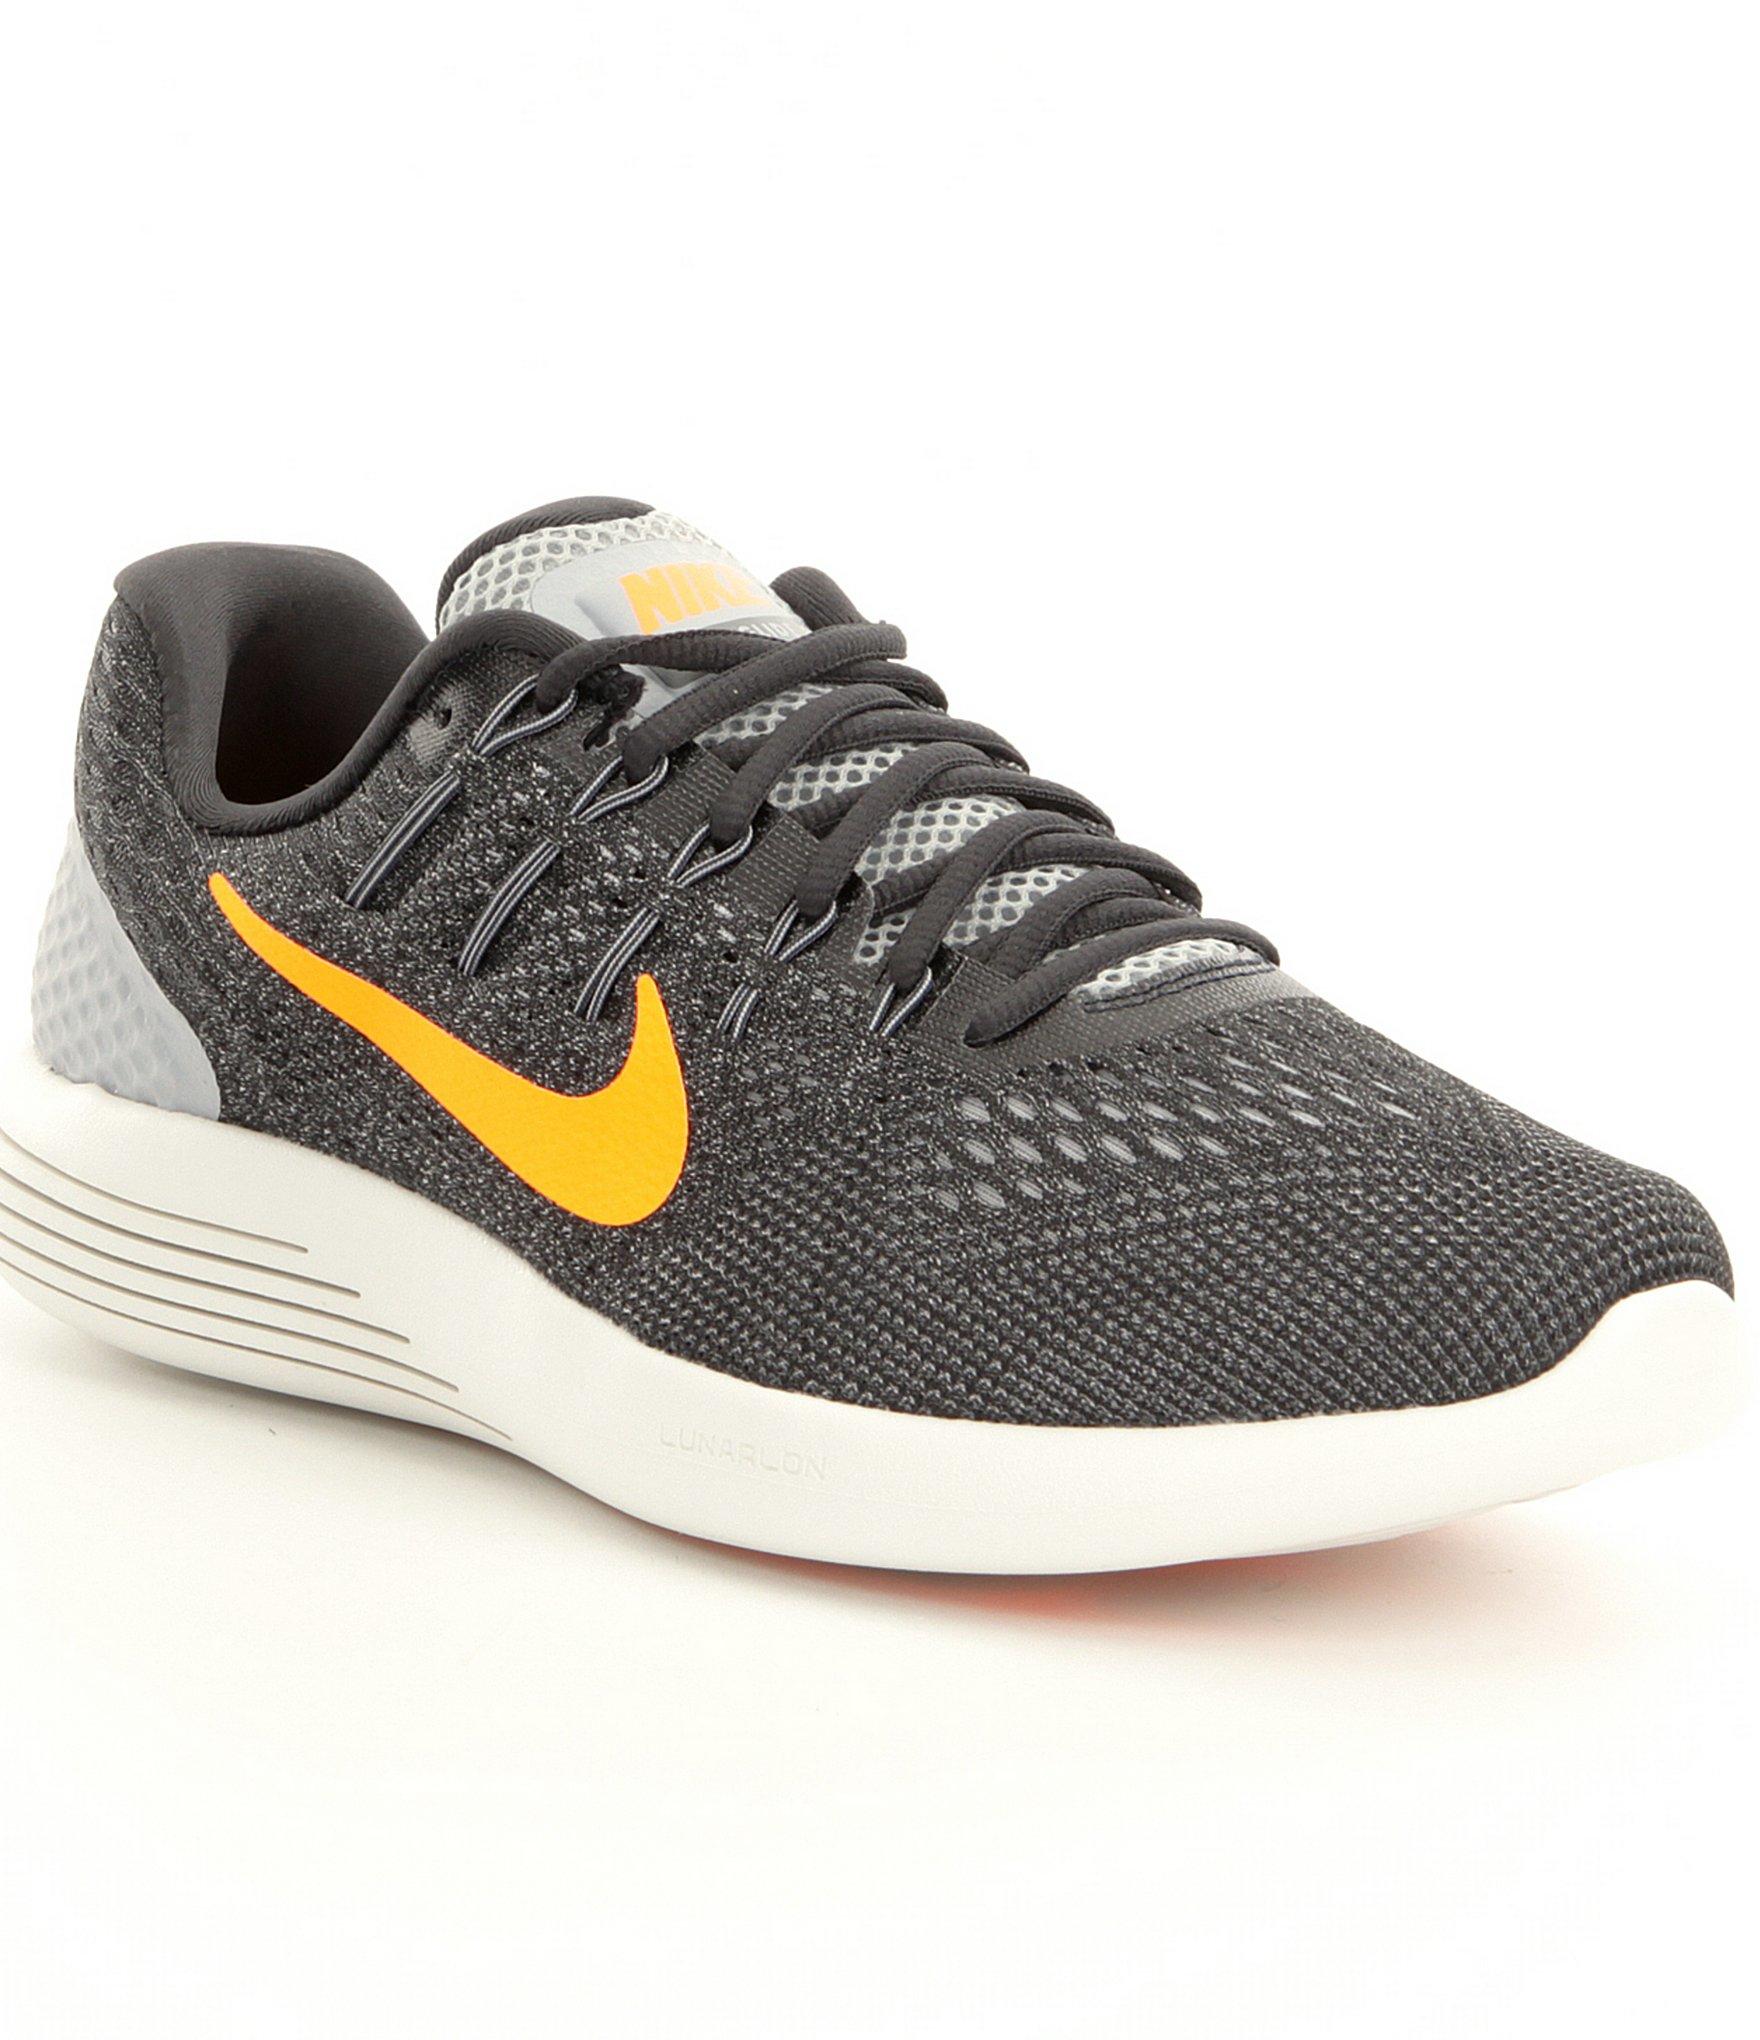 b3b01325c16d Lyst - Nike Lunarglide 8 Men ́s Running Shoes in Gray for Men